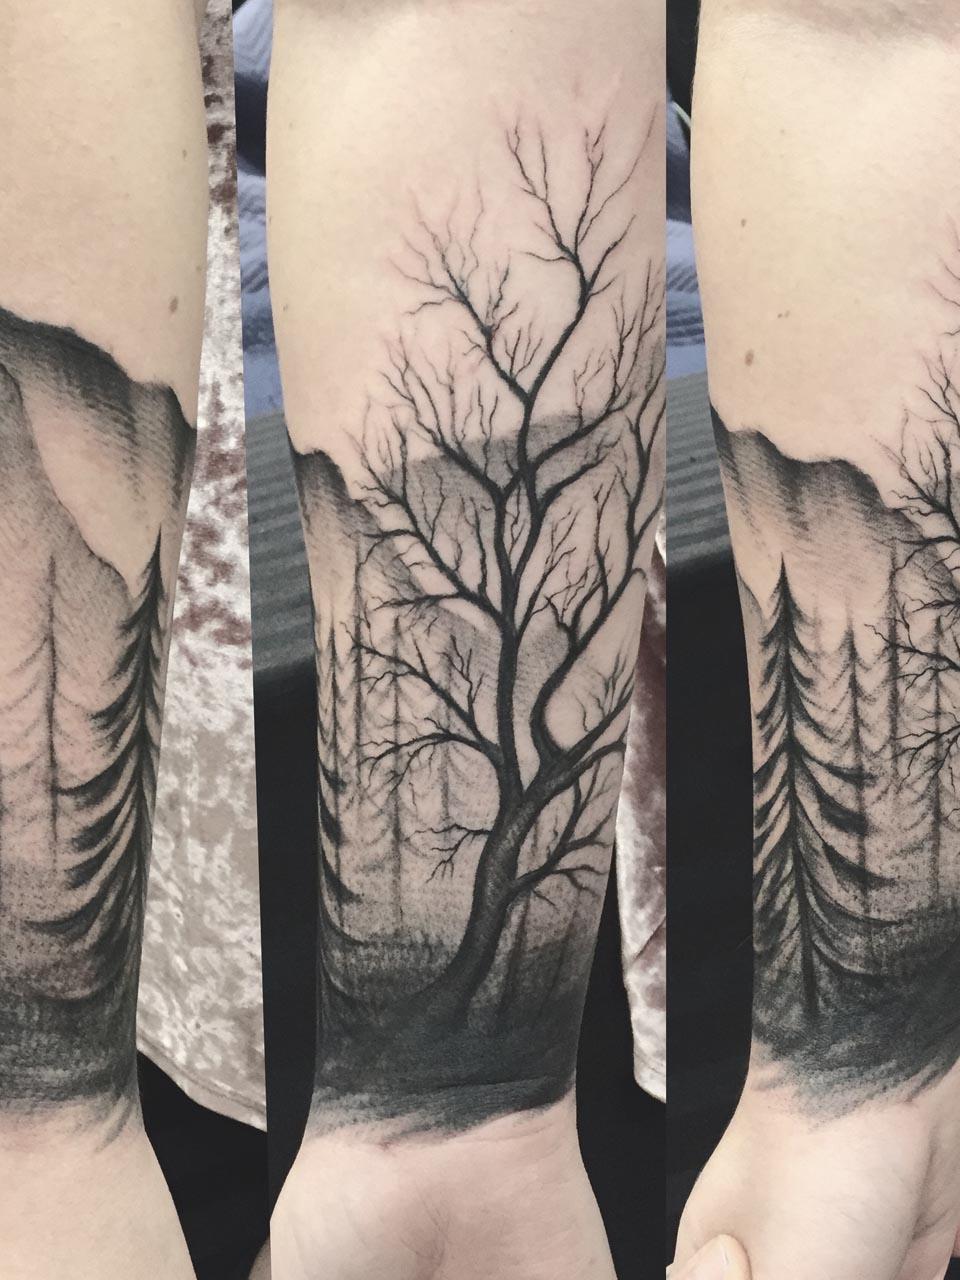 kevin-deuso-tattoo-009-black-forearm-sleeve